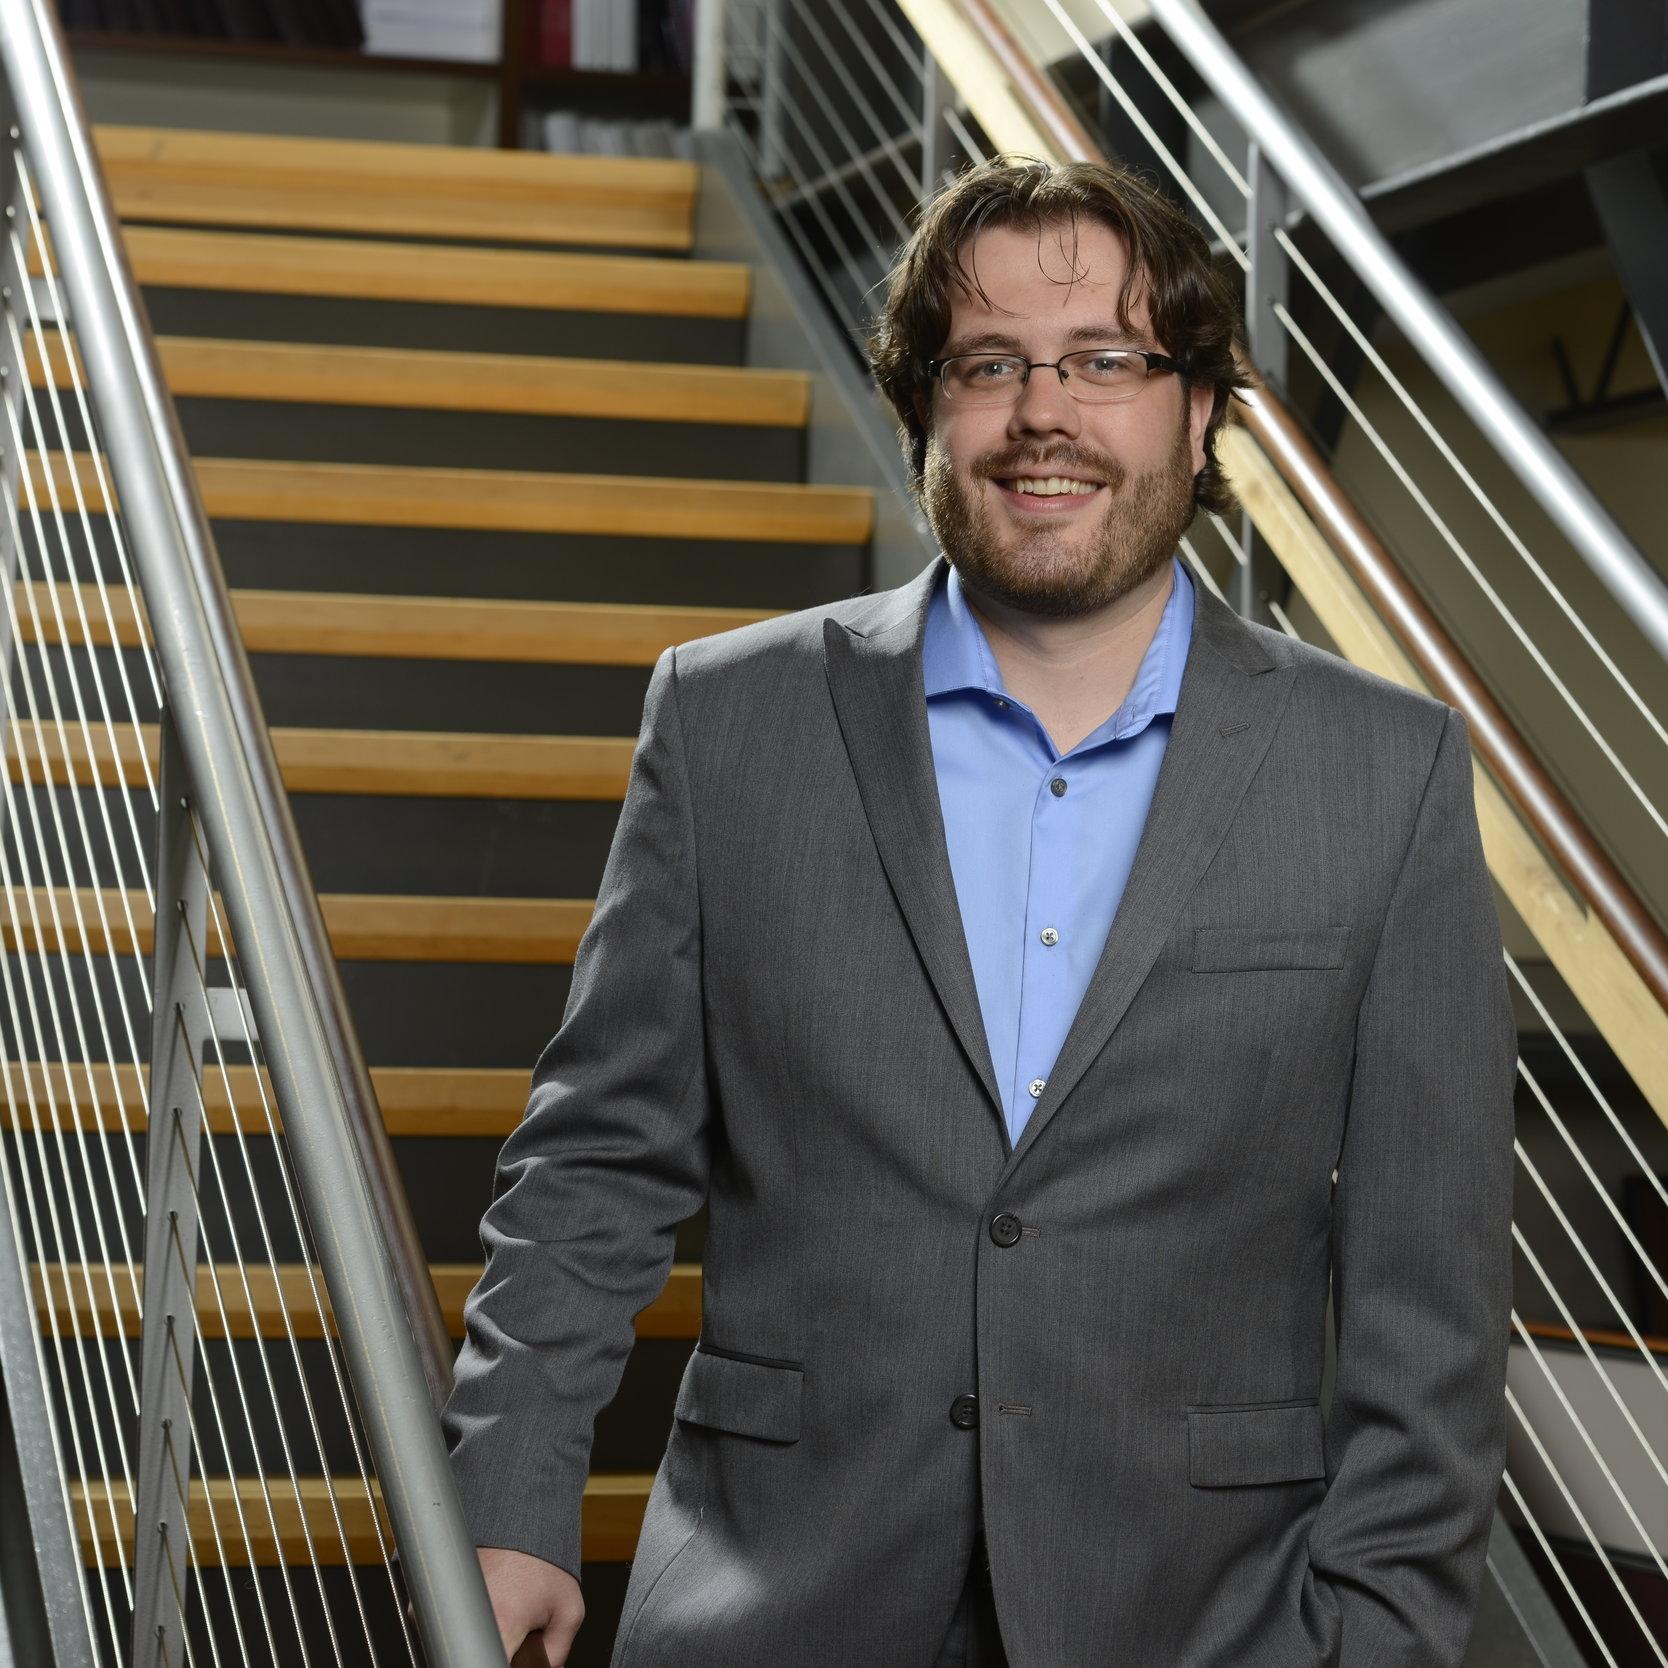 Josh Yoder HR Business Development Manager Cornerstone Design Architects Lancaster Pennsylvania Architect Firm